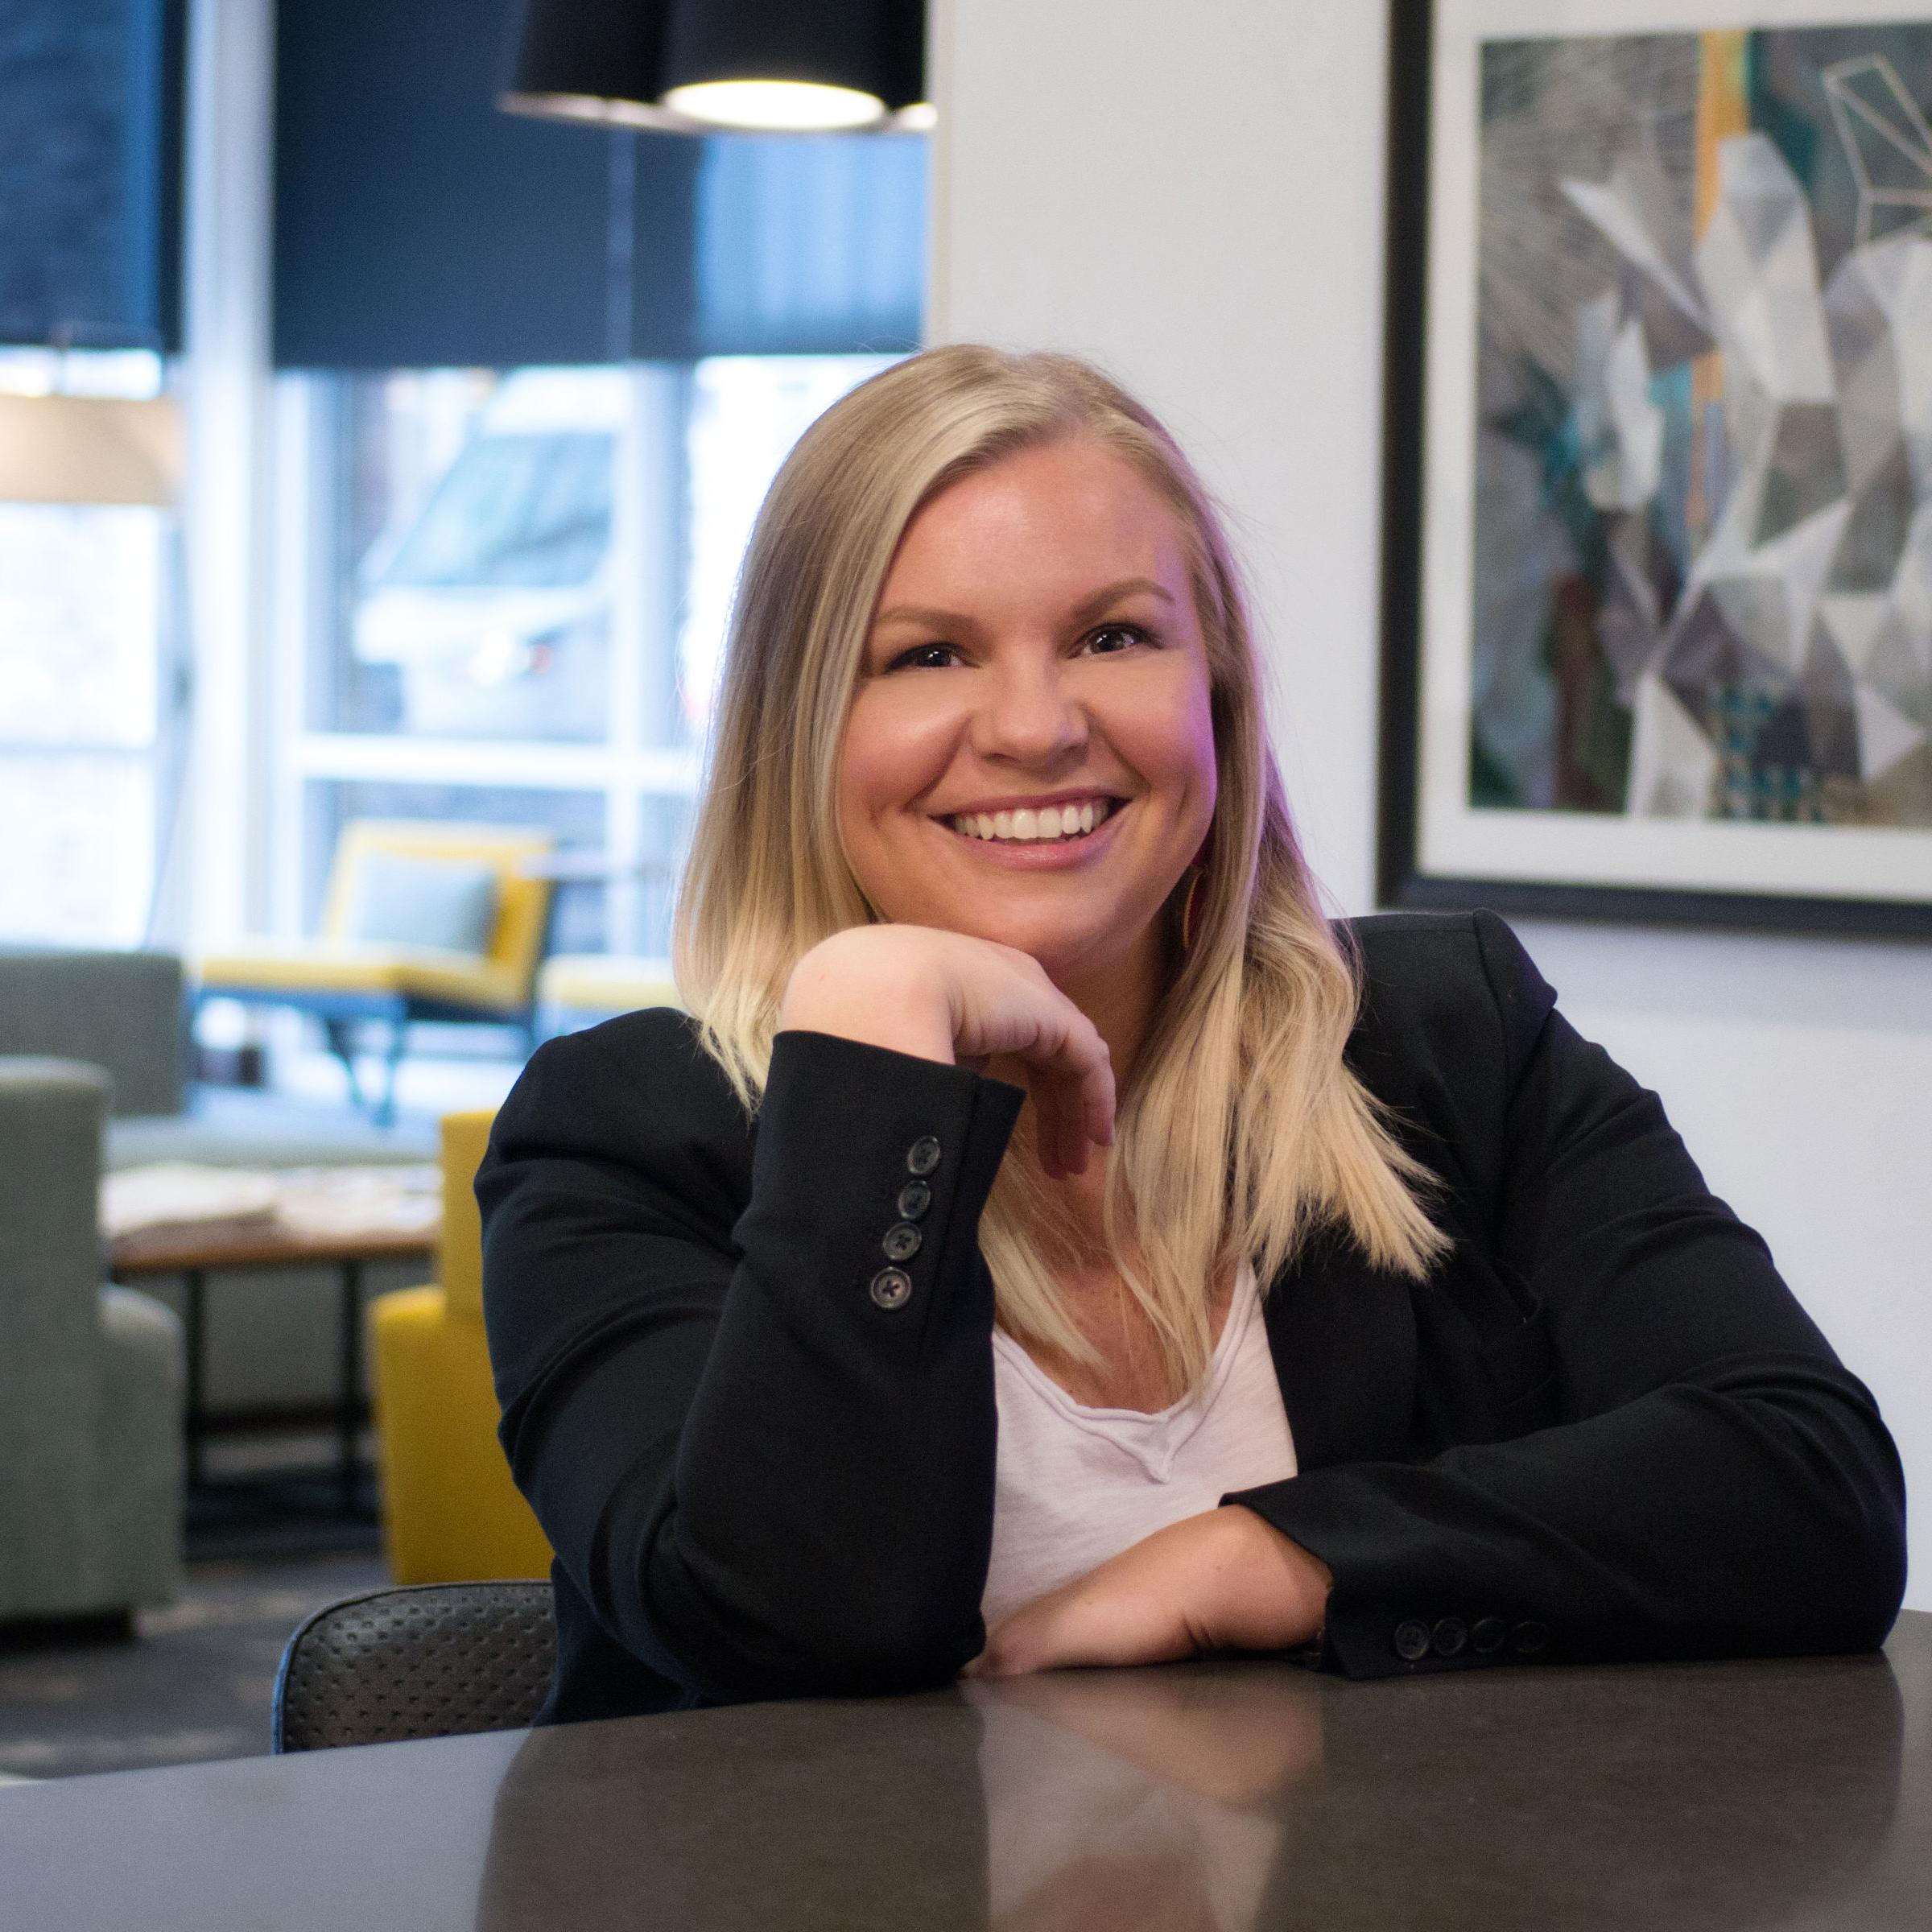 Lindsay Fischer - Principal & Co-Founder